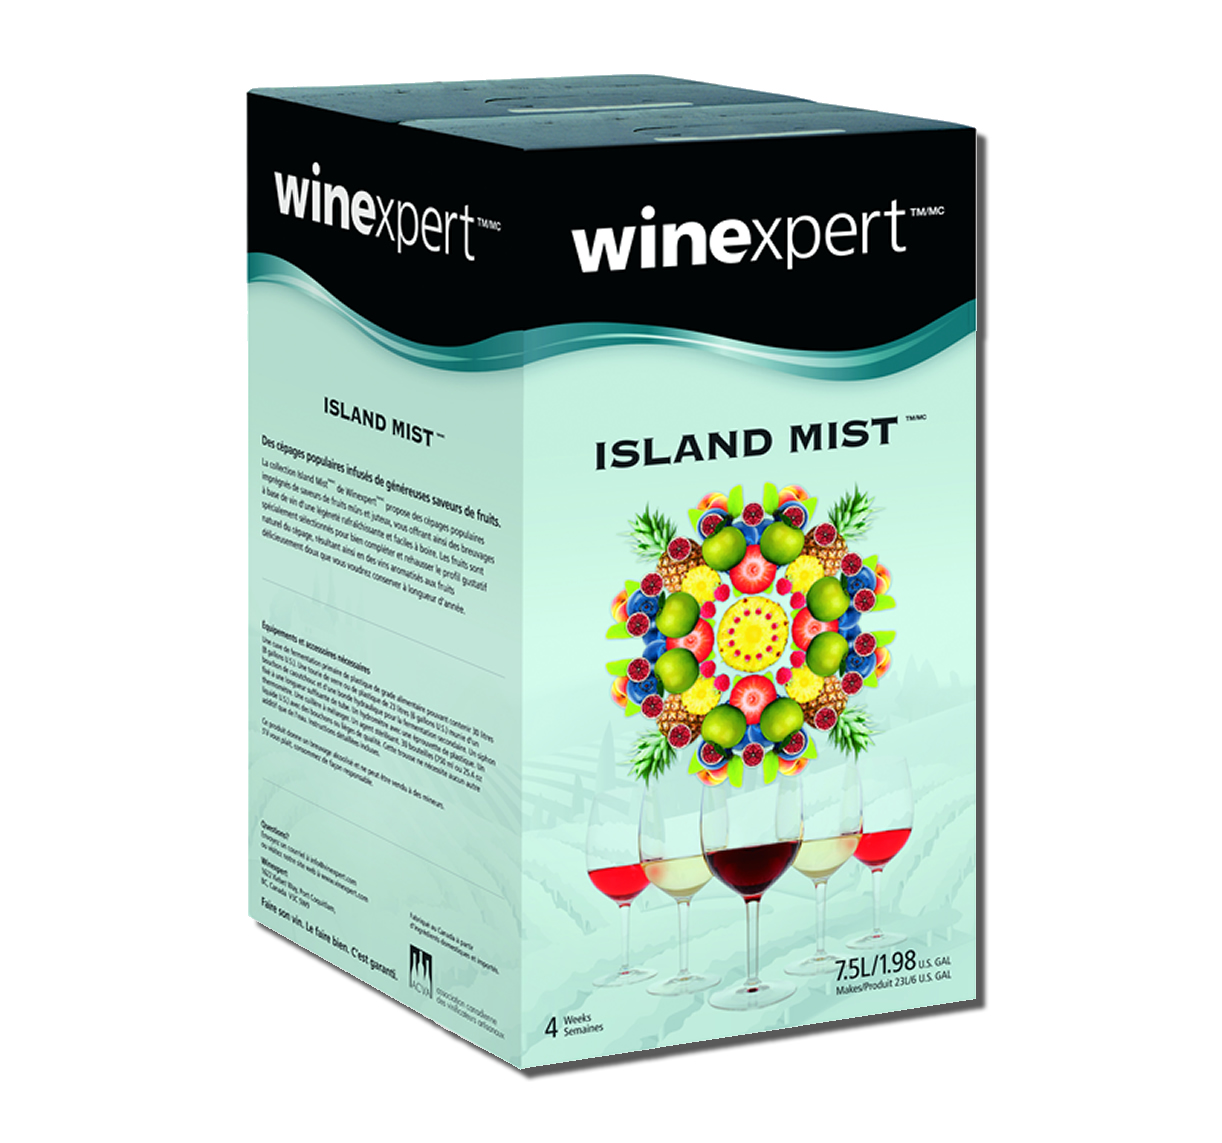 Island Mist Kiwi:Pear Sauv Blanc (1)